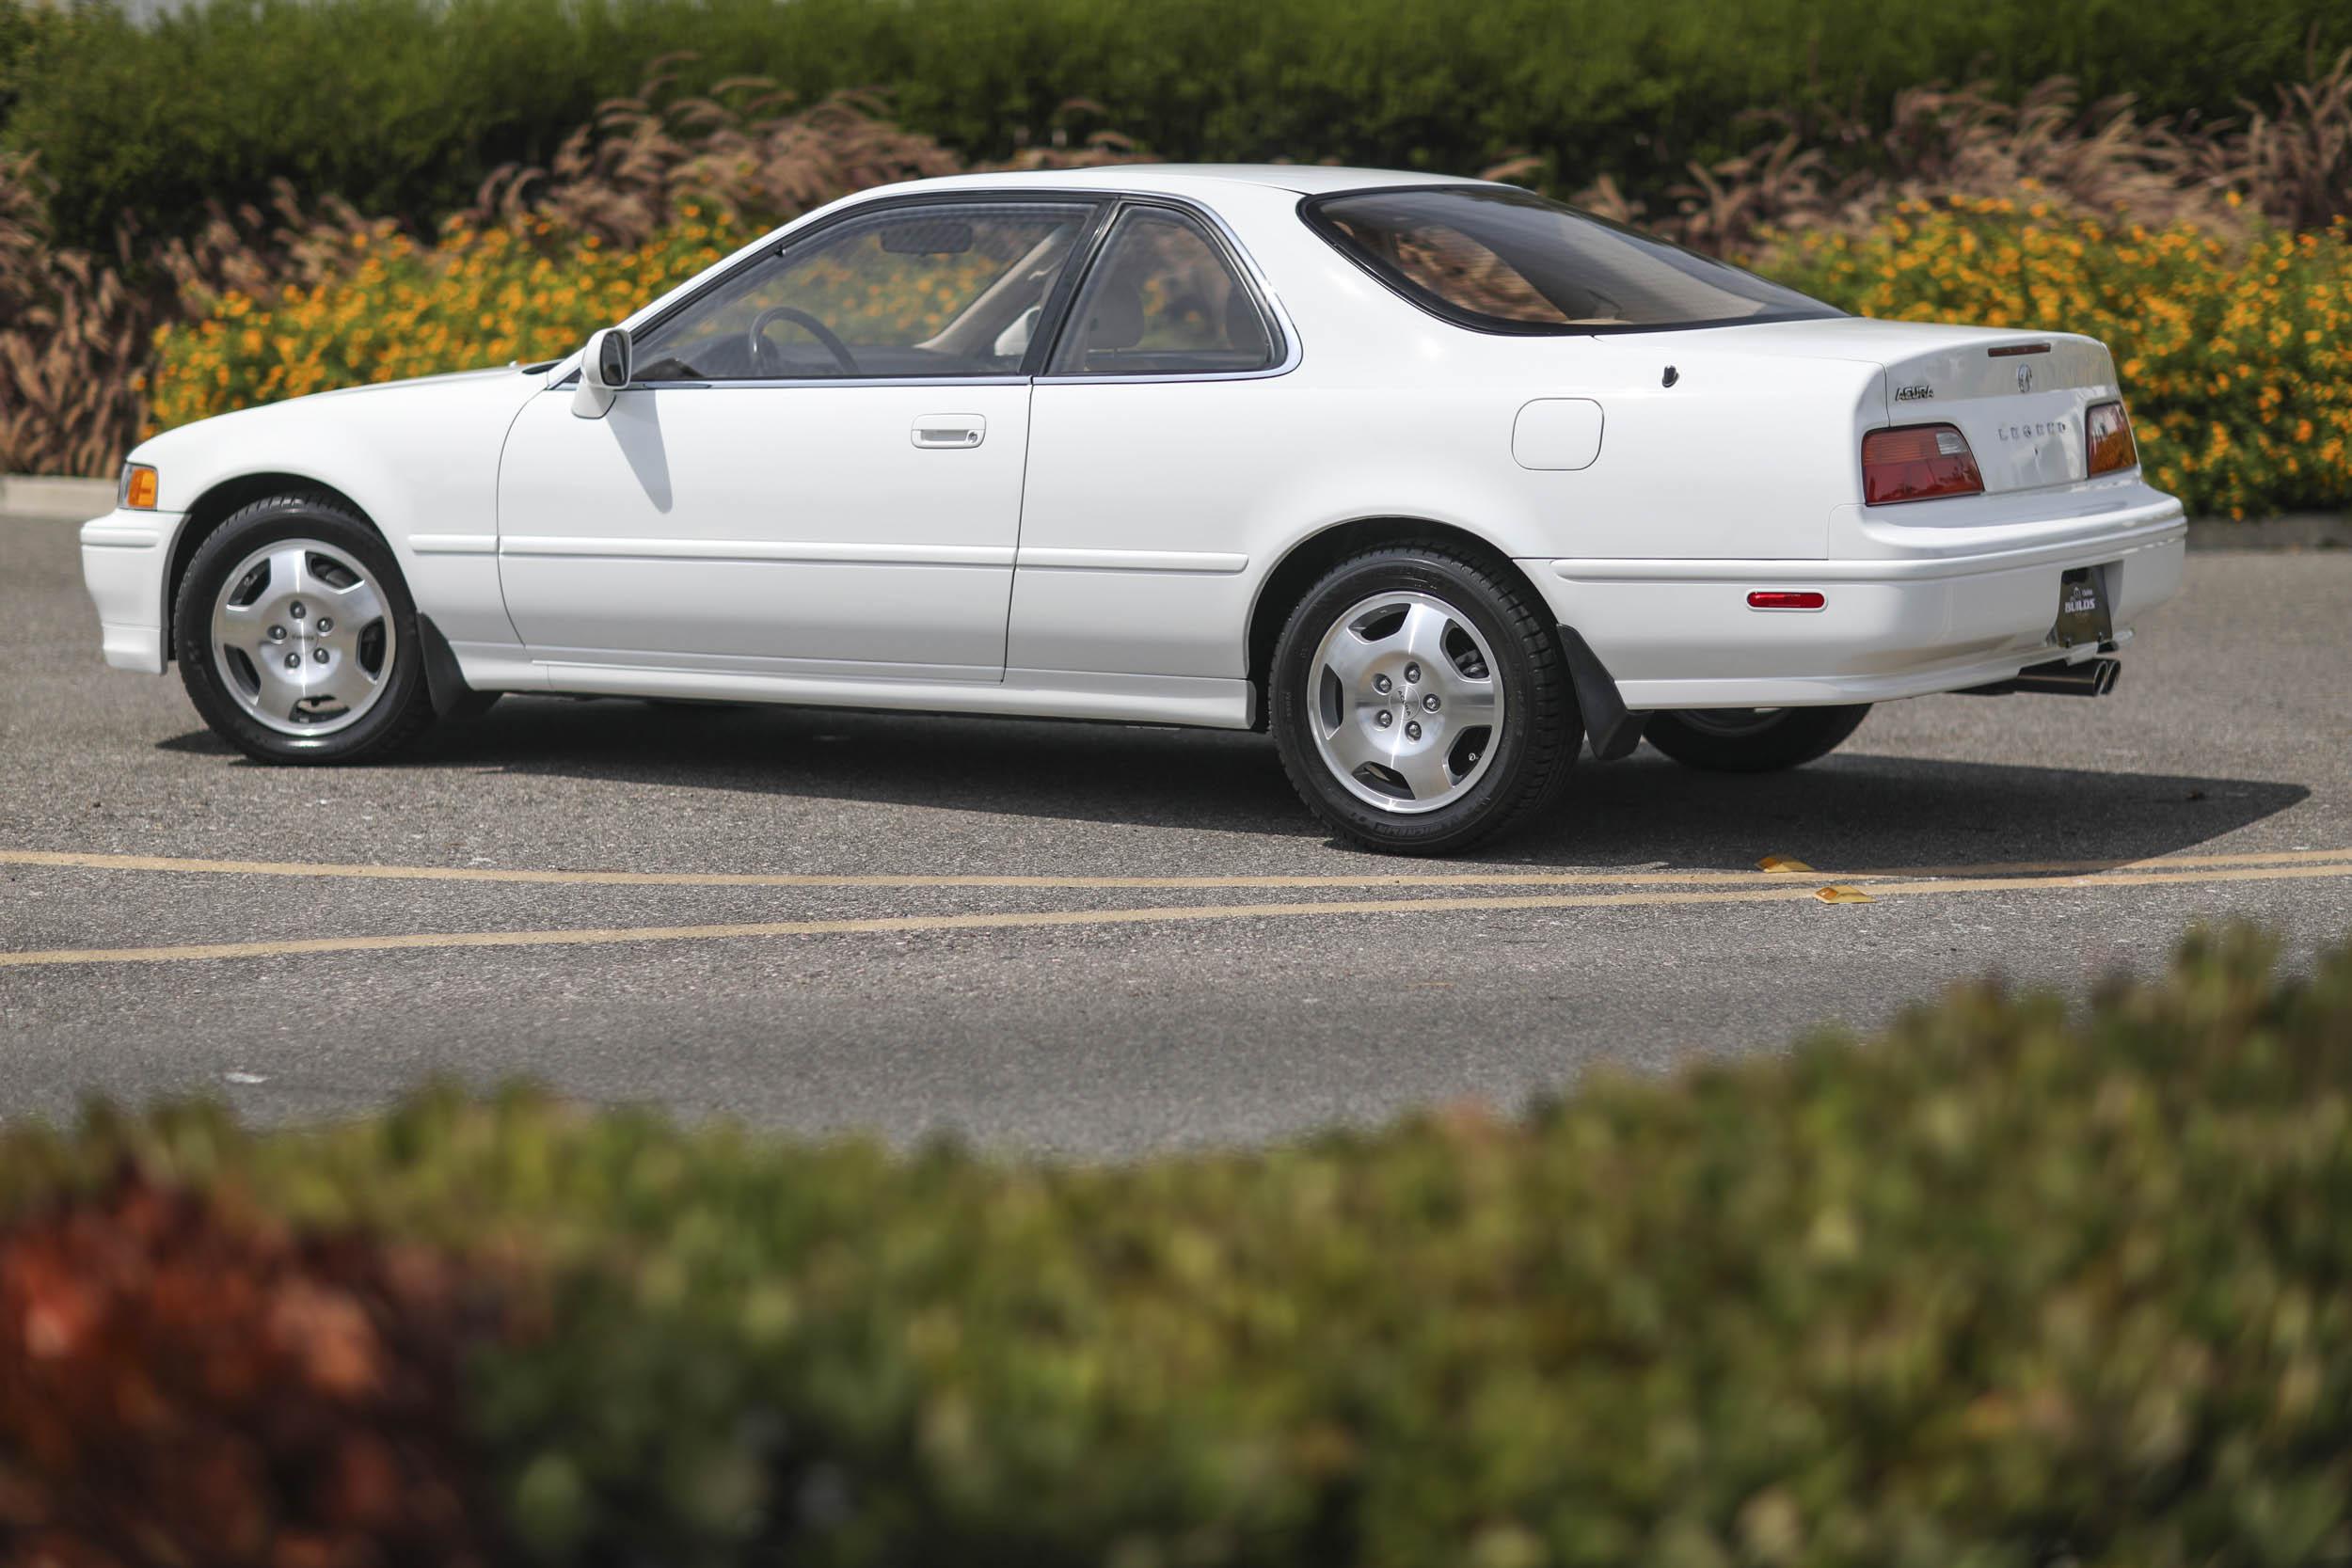 1994 Acura Legend Coupe LS profile